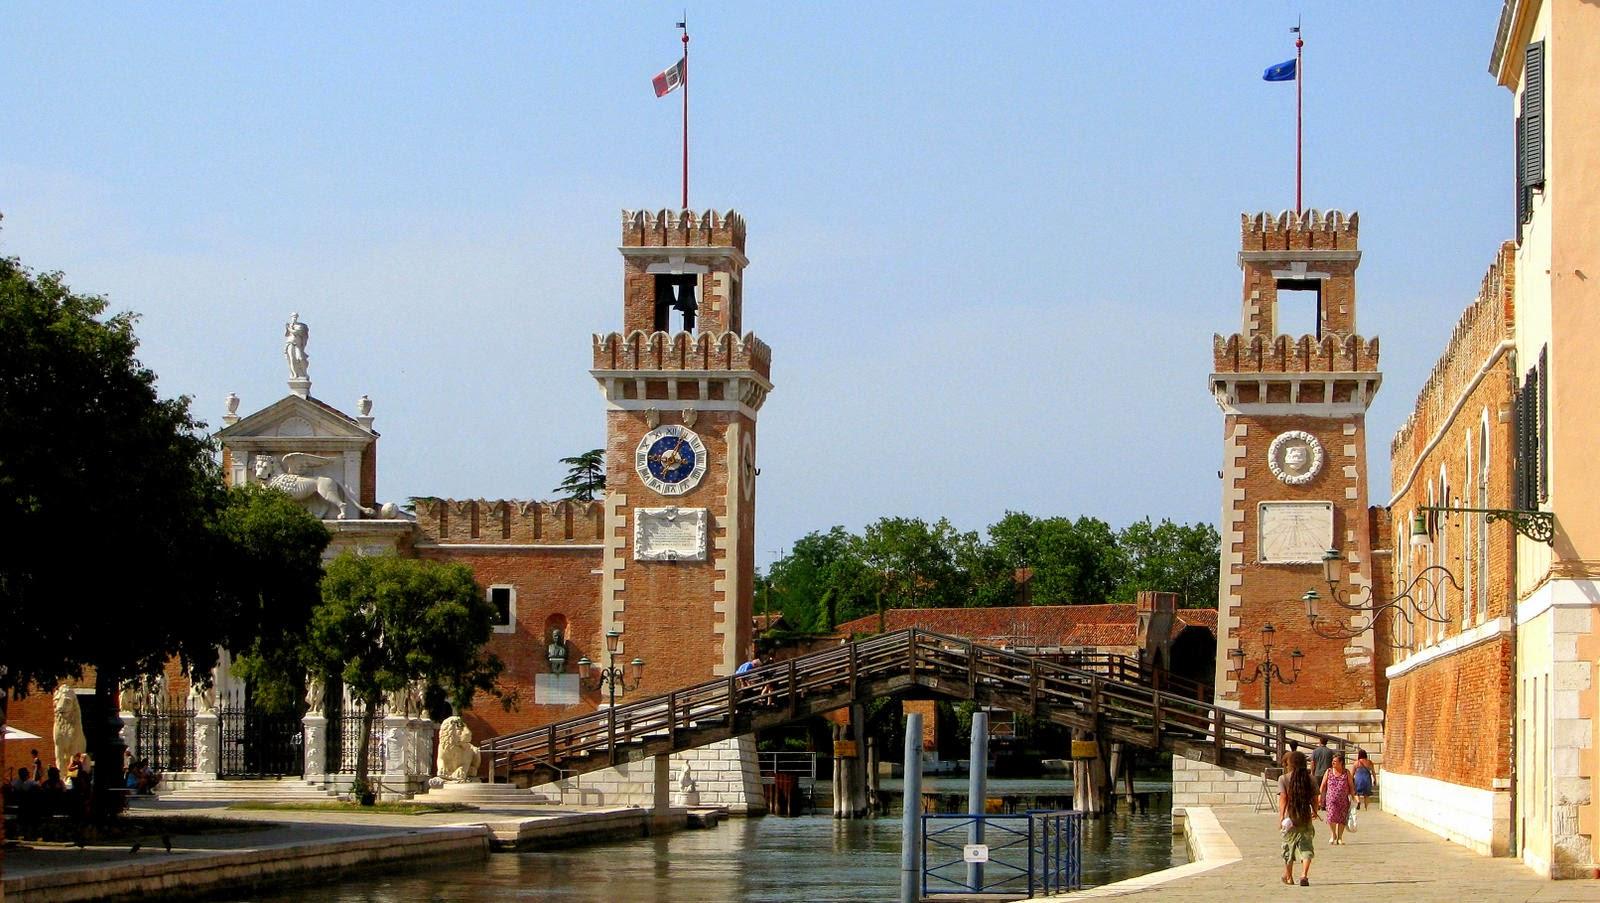 Arsenale di Venezia, Photo by Gunther H.G. Geick